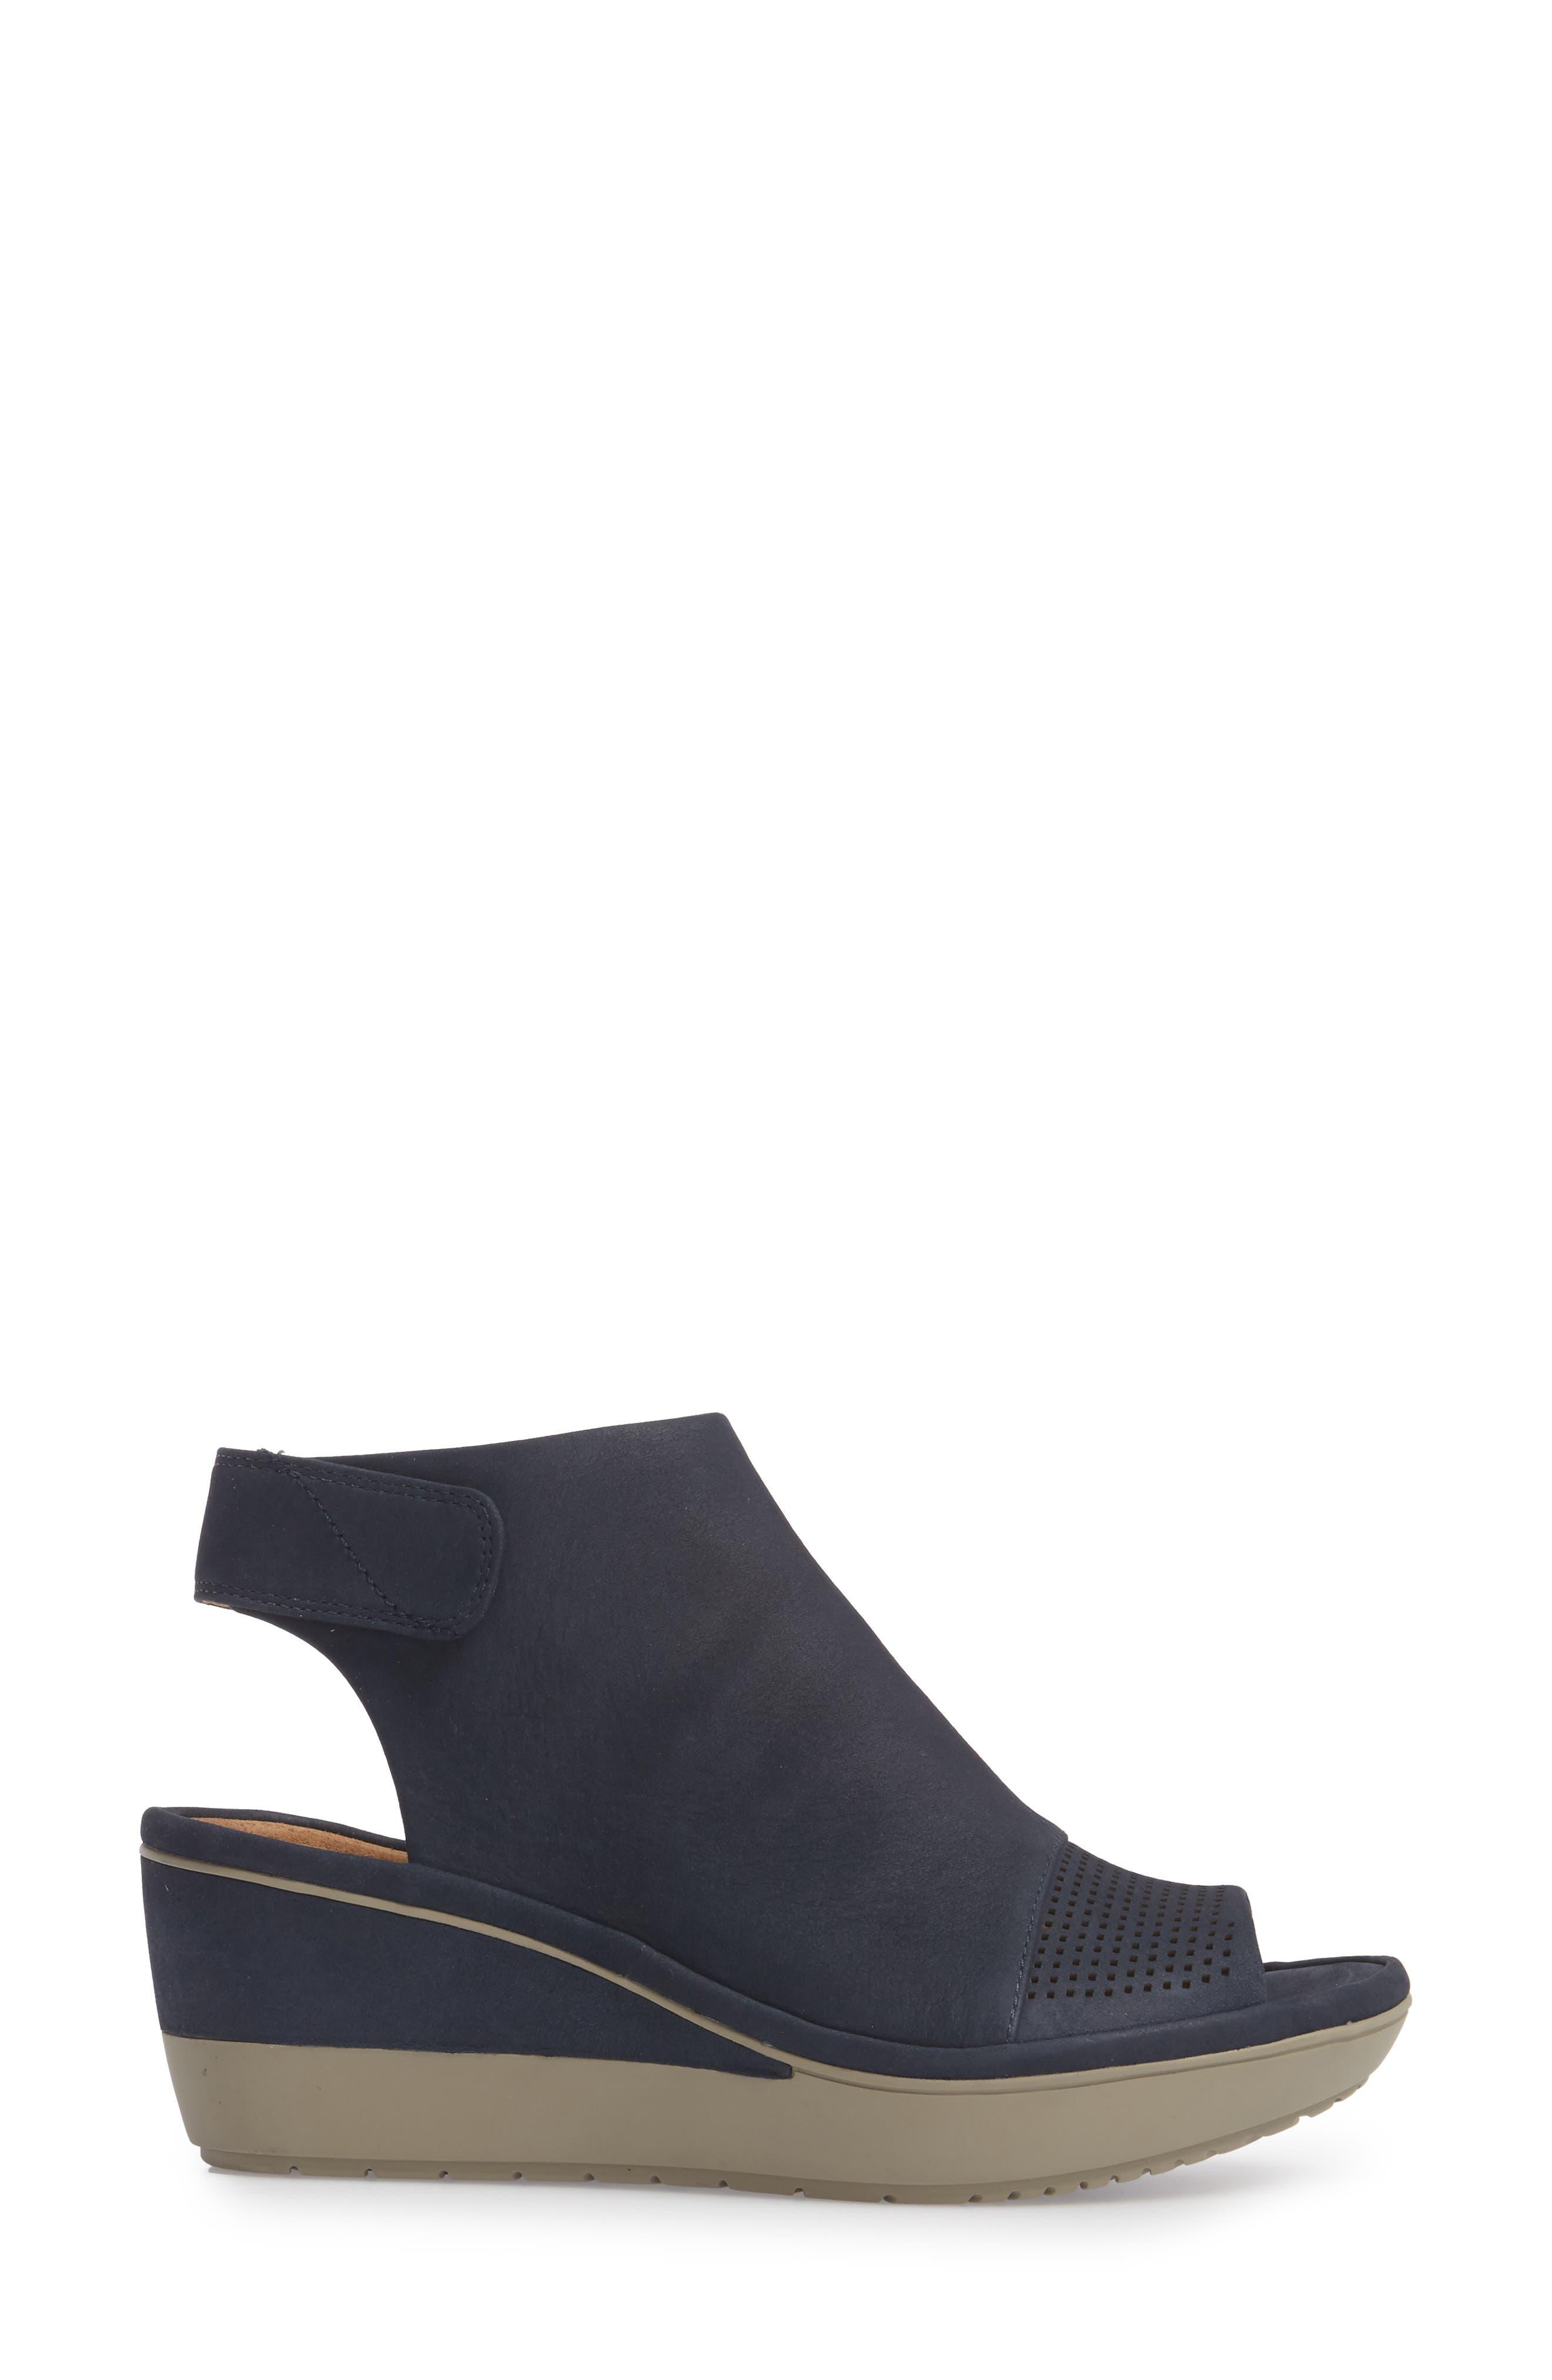 Alternate Image 3  - Clarks® Wynnmere Abie Wedge Sandal (Women)